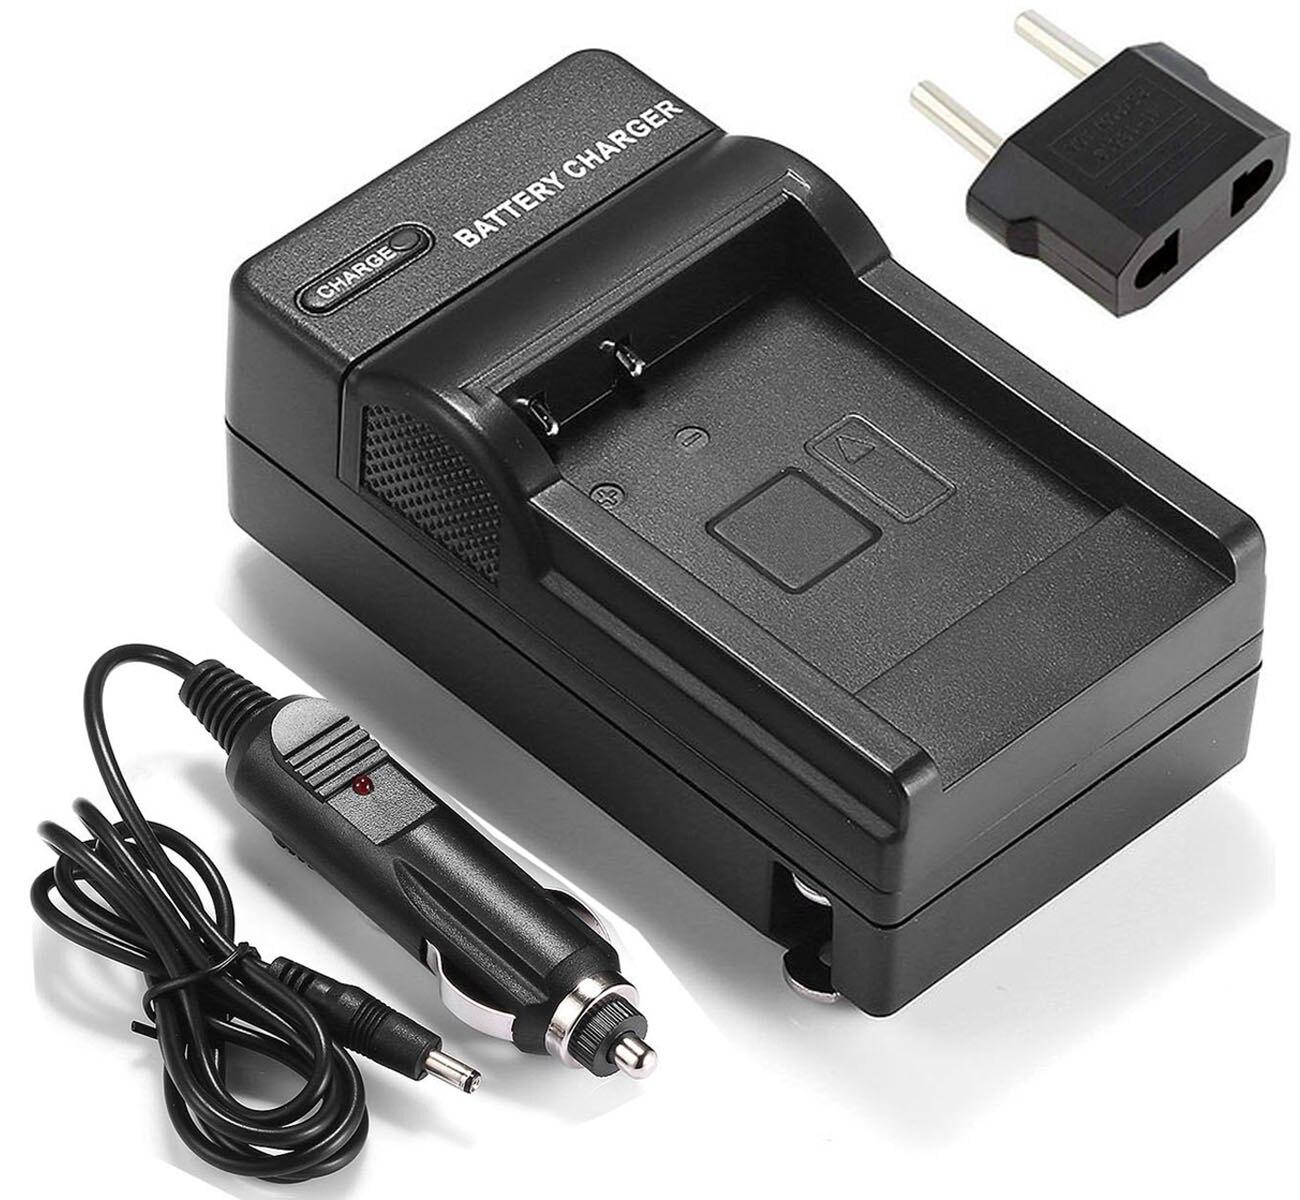 Battery Charger for JVC BN VG107  BN VG107U  BN VG107E  BN VG108  BN VG108U  BN VG108E  BN VG114  BN VG121|Camera Charger| |  - title=